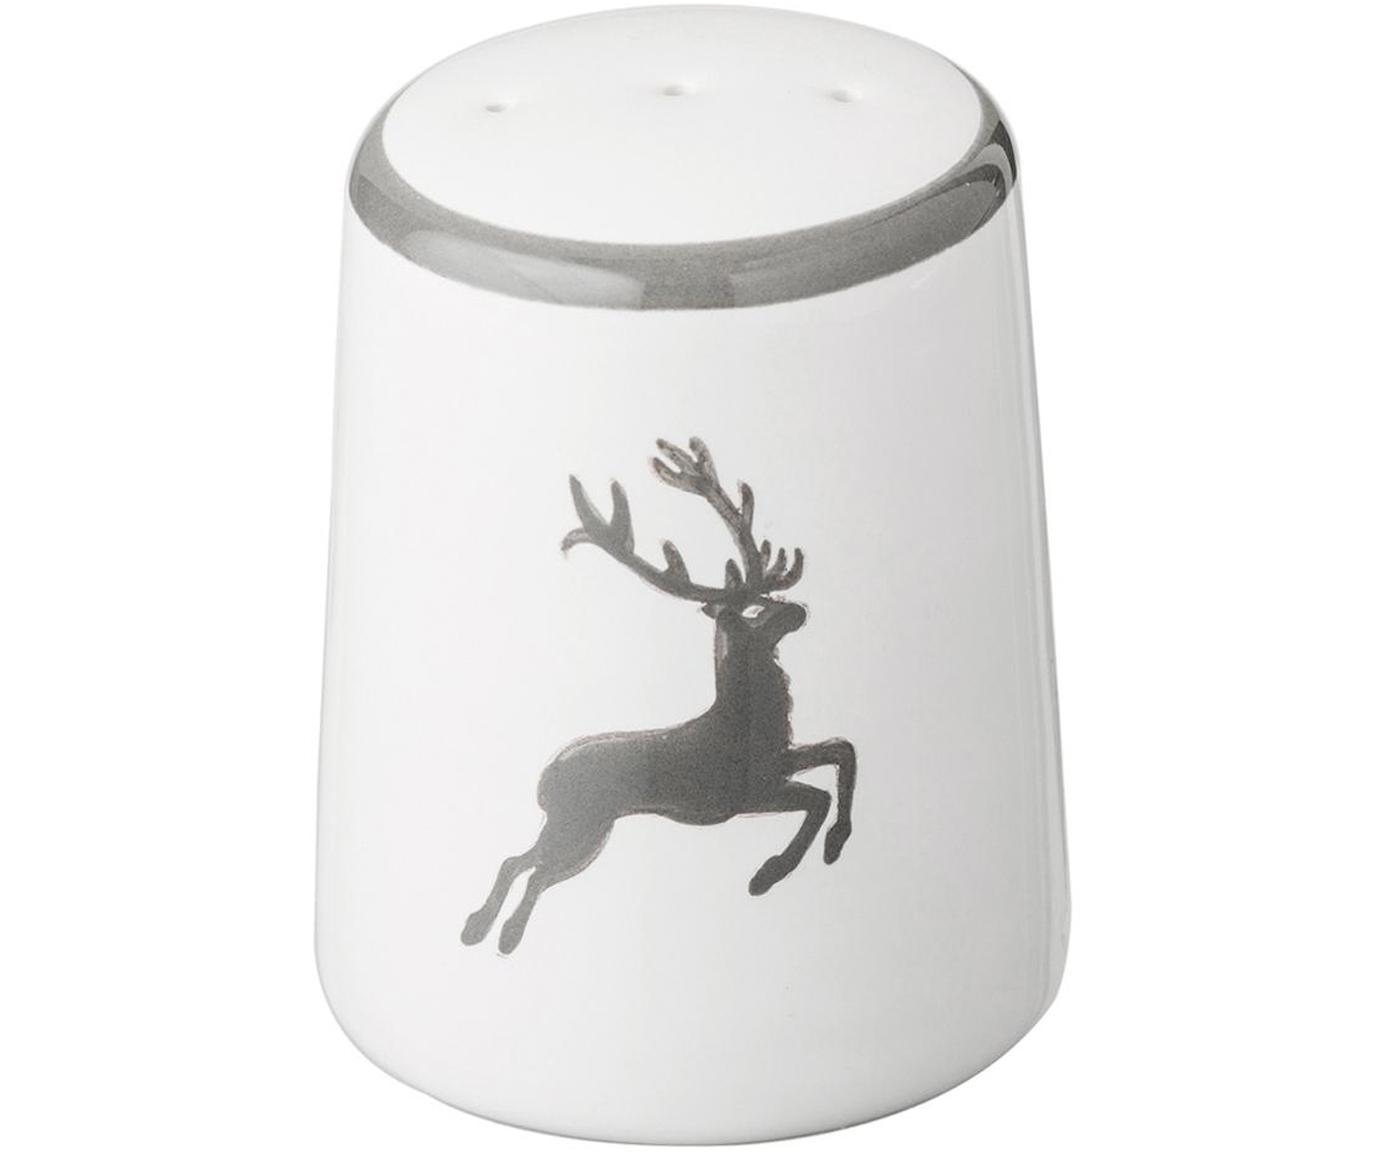 Pepiera dipinta a mano con cervo Classic, Ceramica, Grigio, bianco, 4 x 6 cm